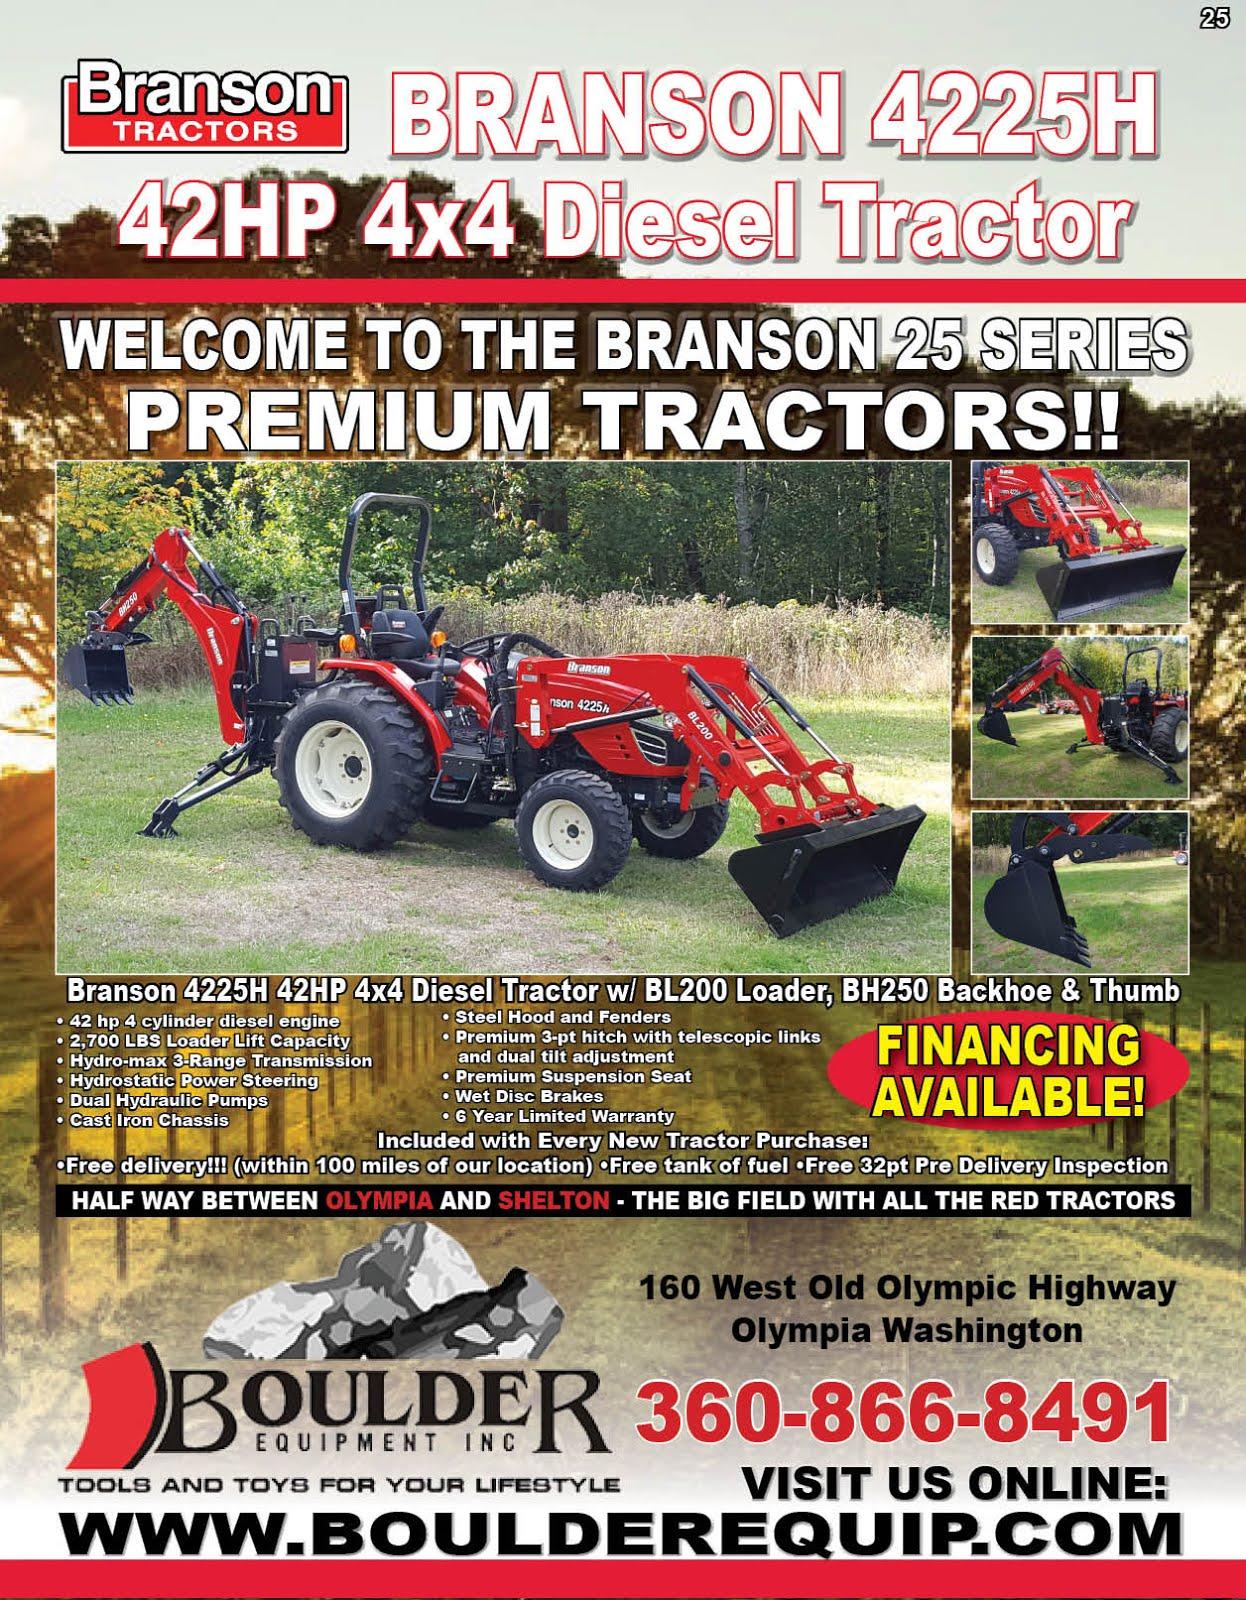 Boulder Equipment Has the New Branson 25 Series Premium Diesel Tractors